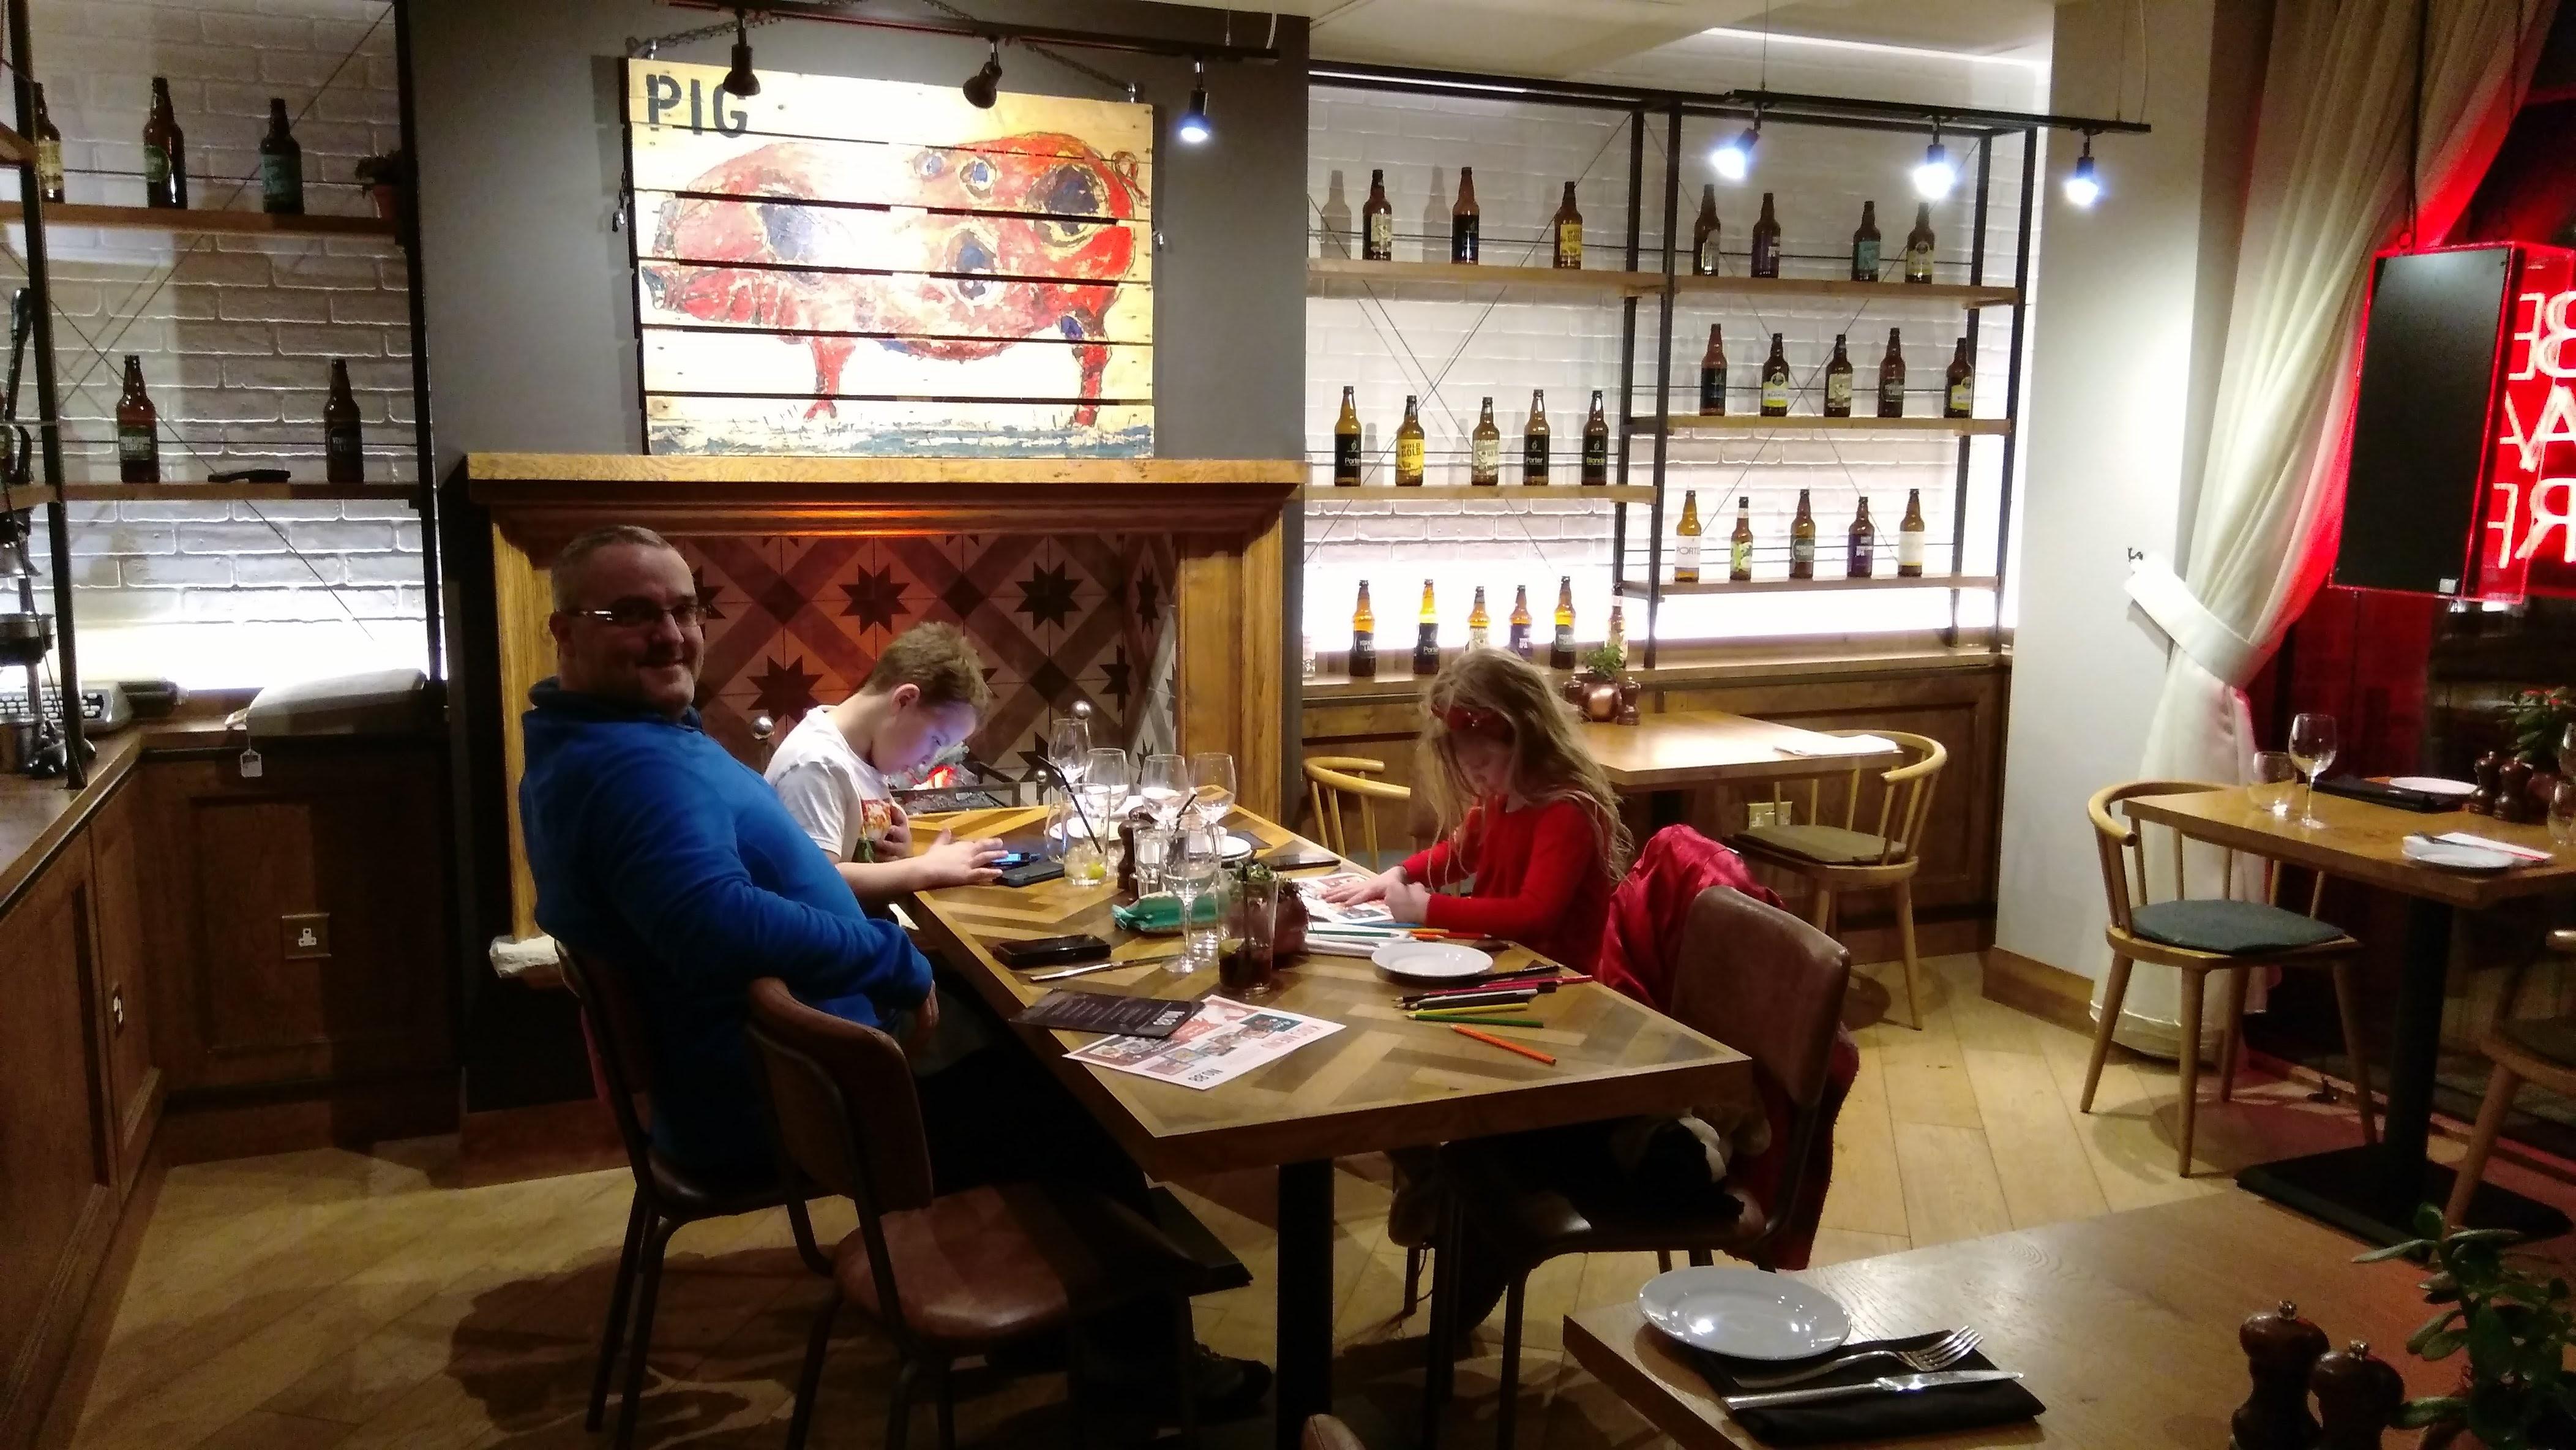 88 Walmgate York Family Friendly Restaurant (10)